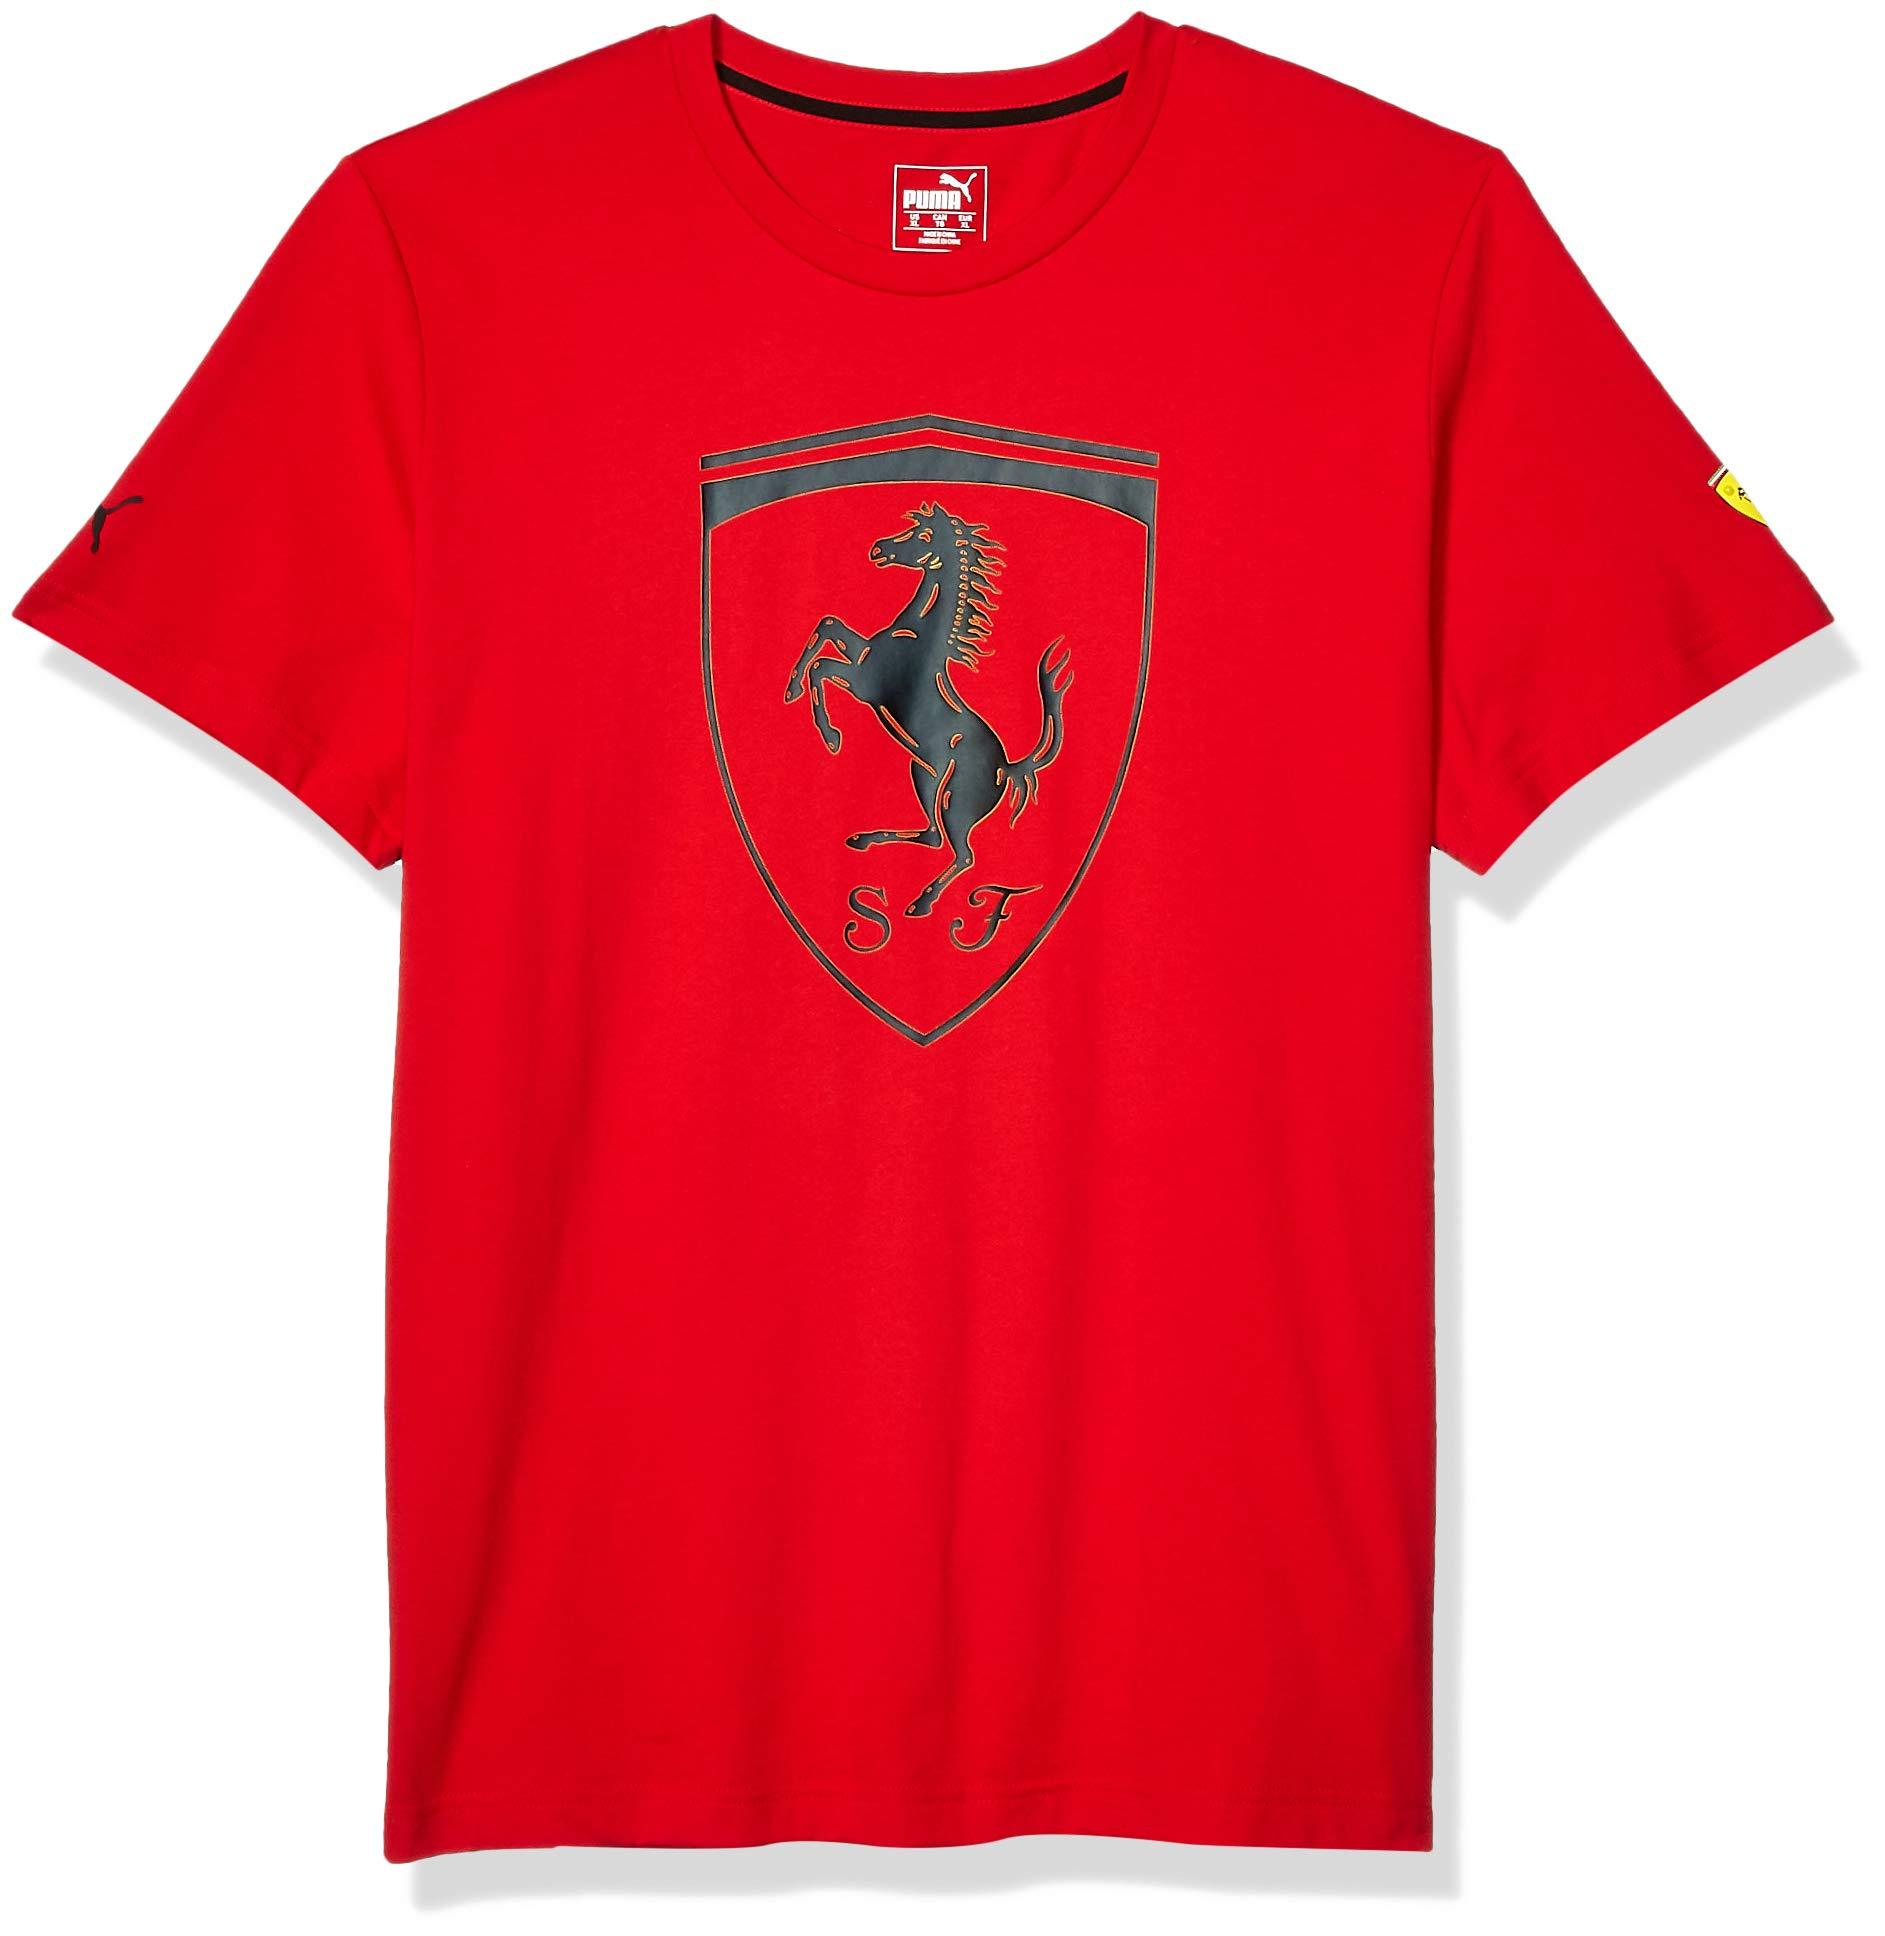 PUMA Men's Scuderia Ferrari Big Shield Tee